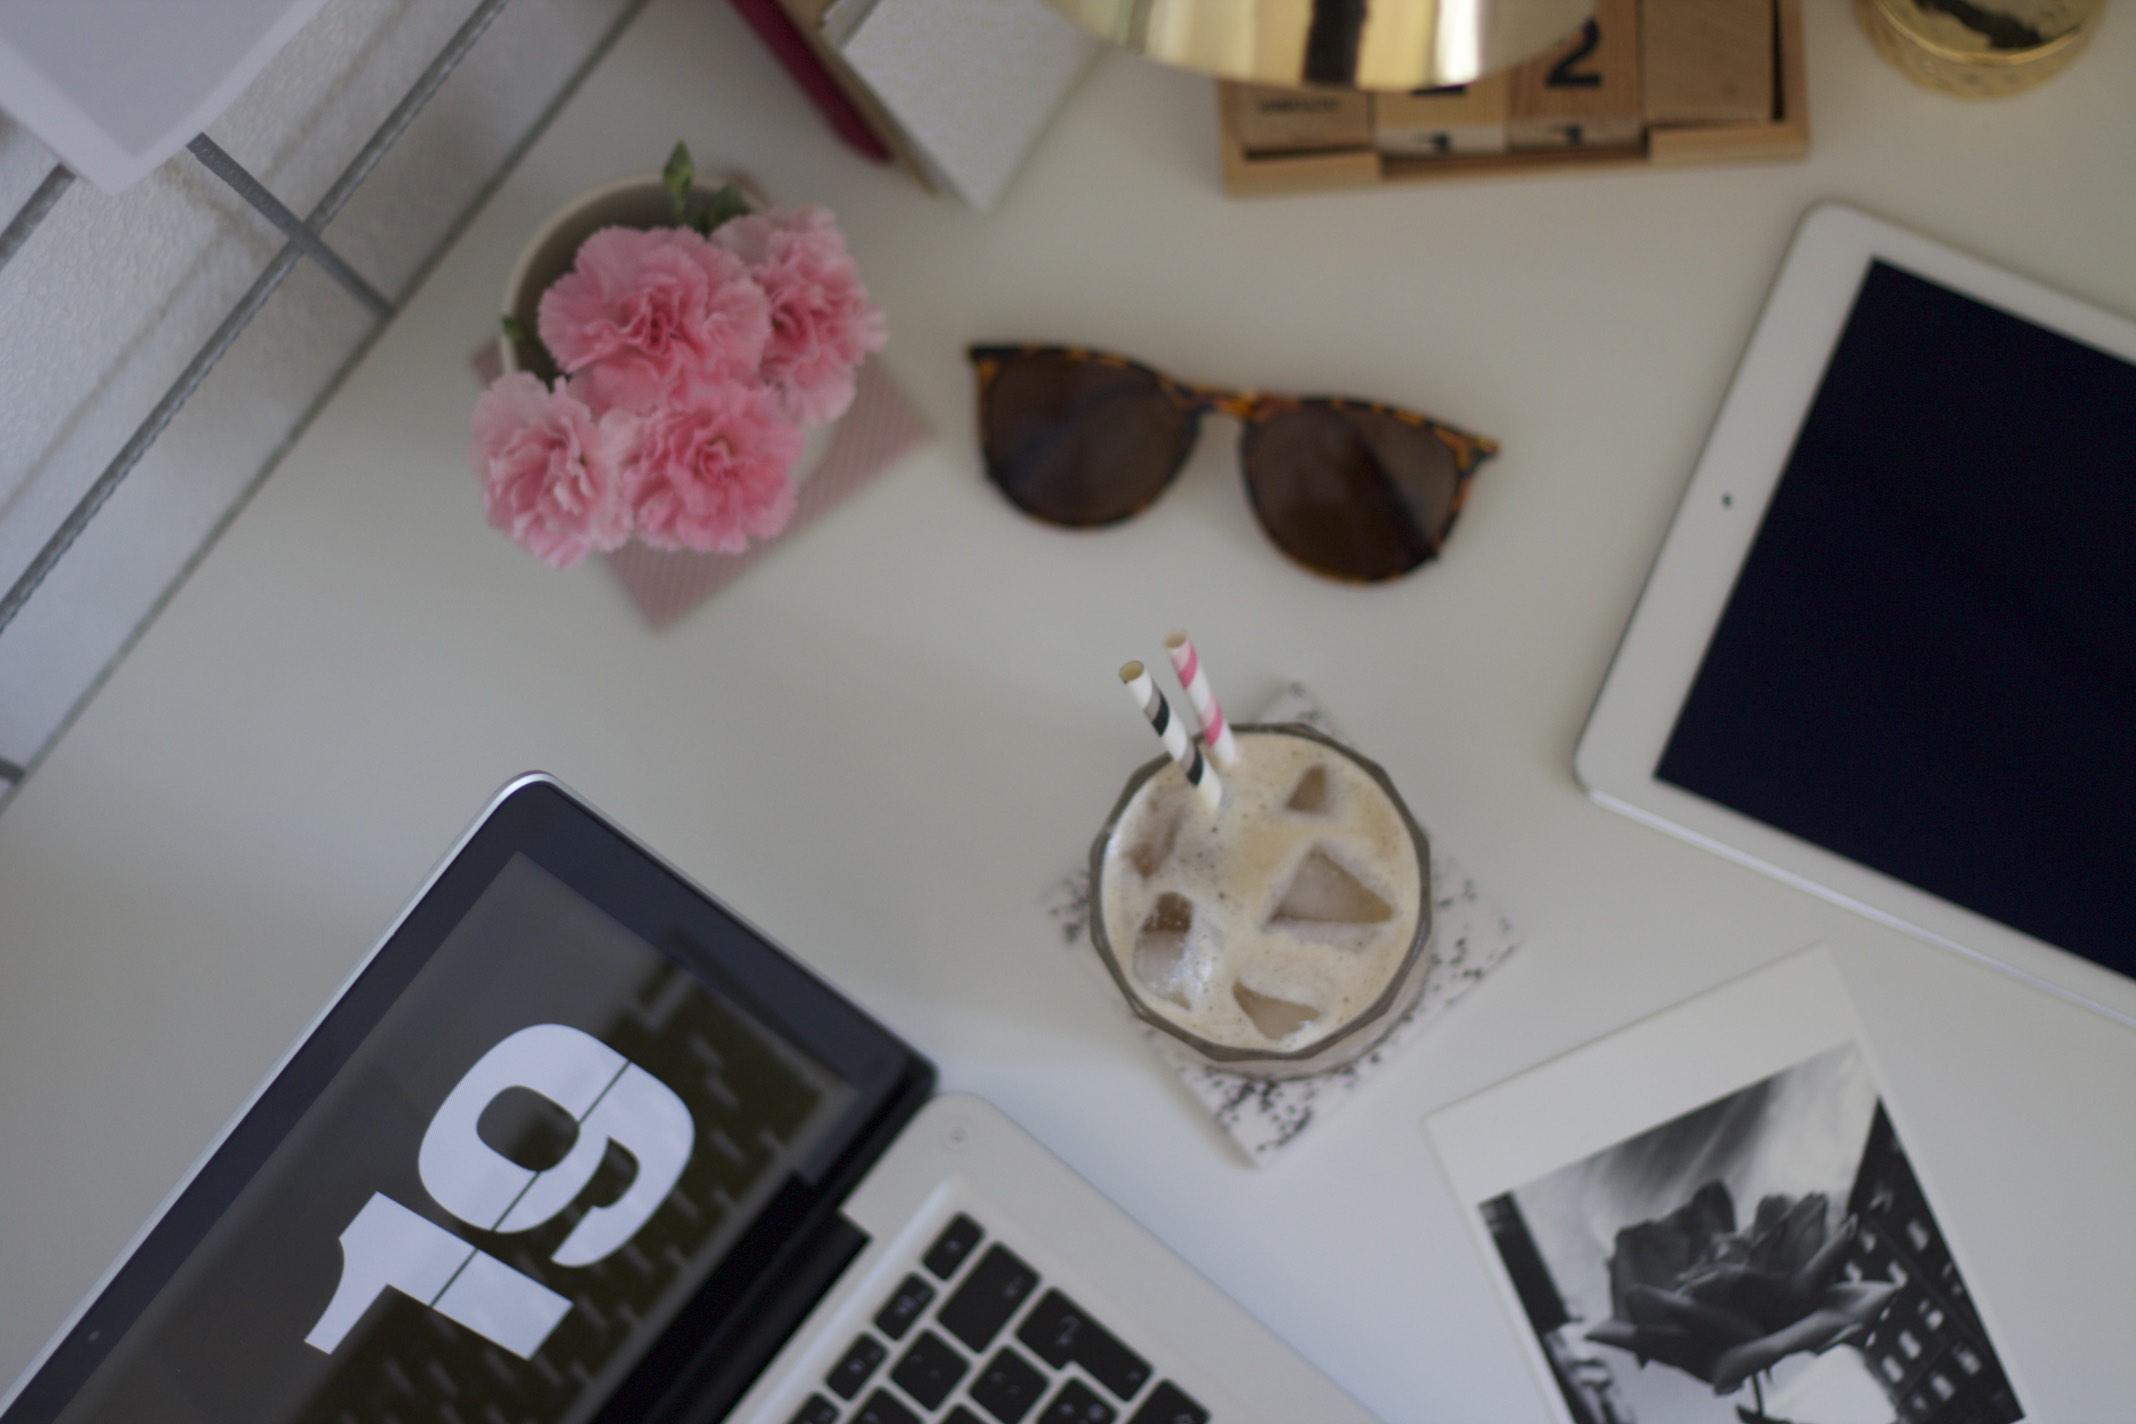 jeanette hardis odense blogger odensebloggers lets blog some shit bloggerevent